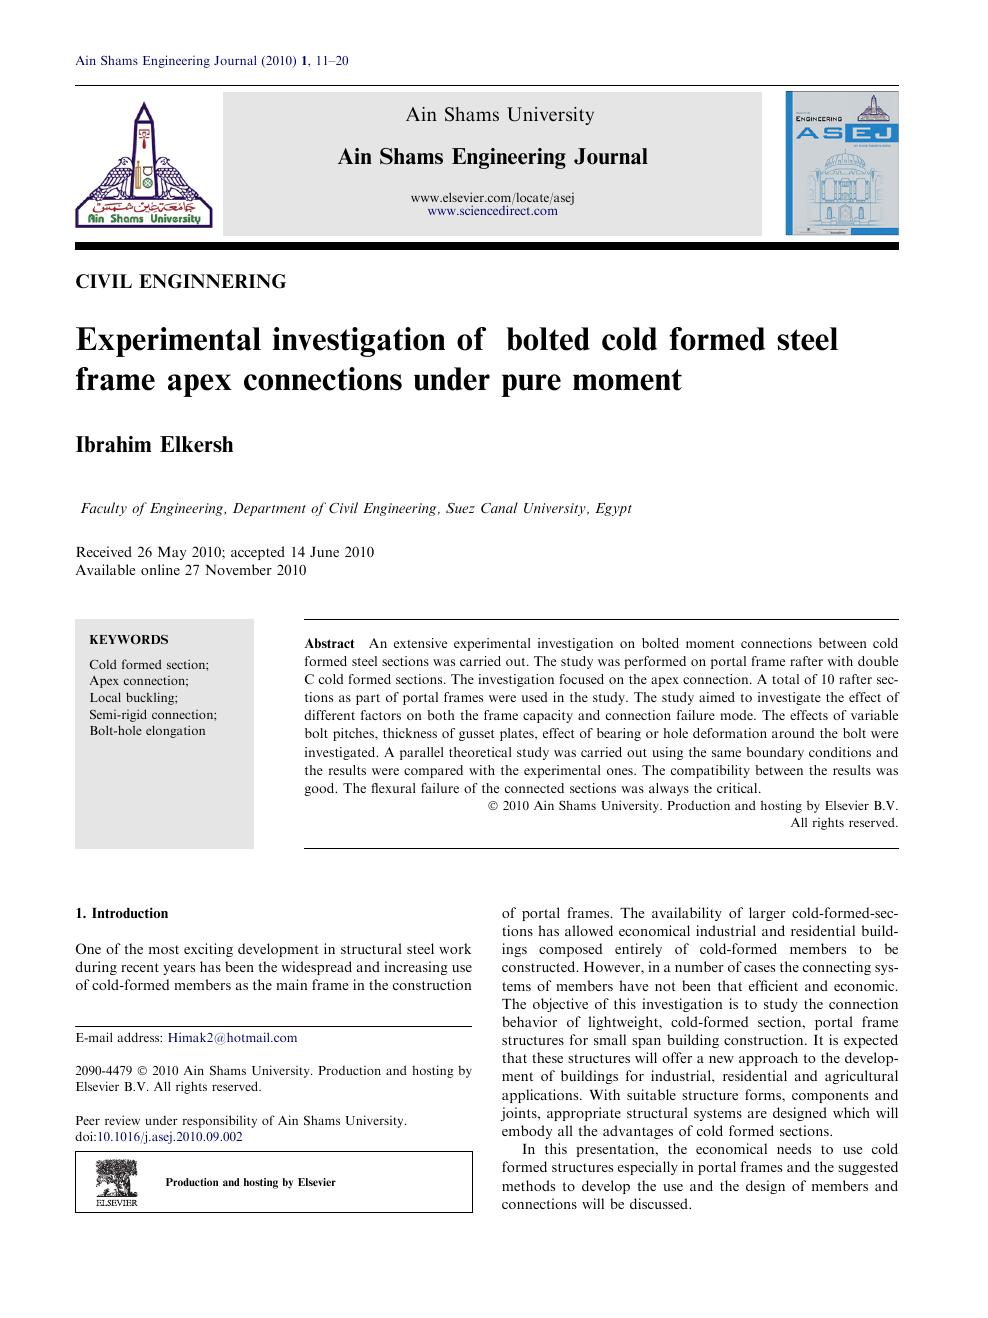 Experimental investigation of bolted cold formed steel frame apex